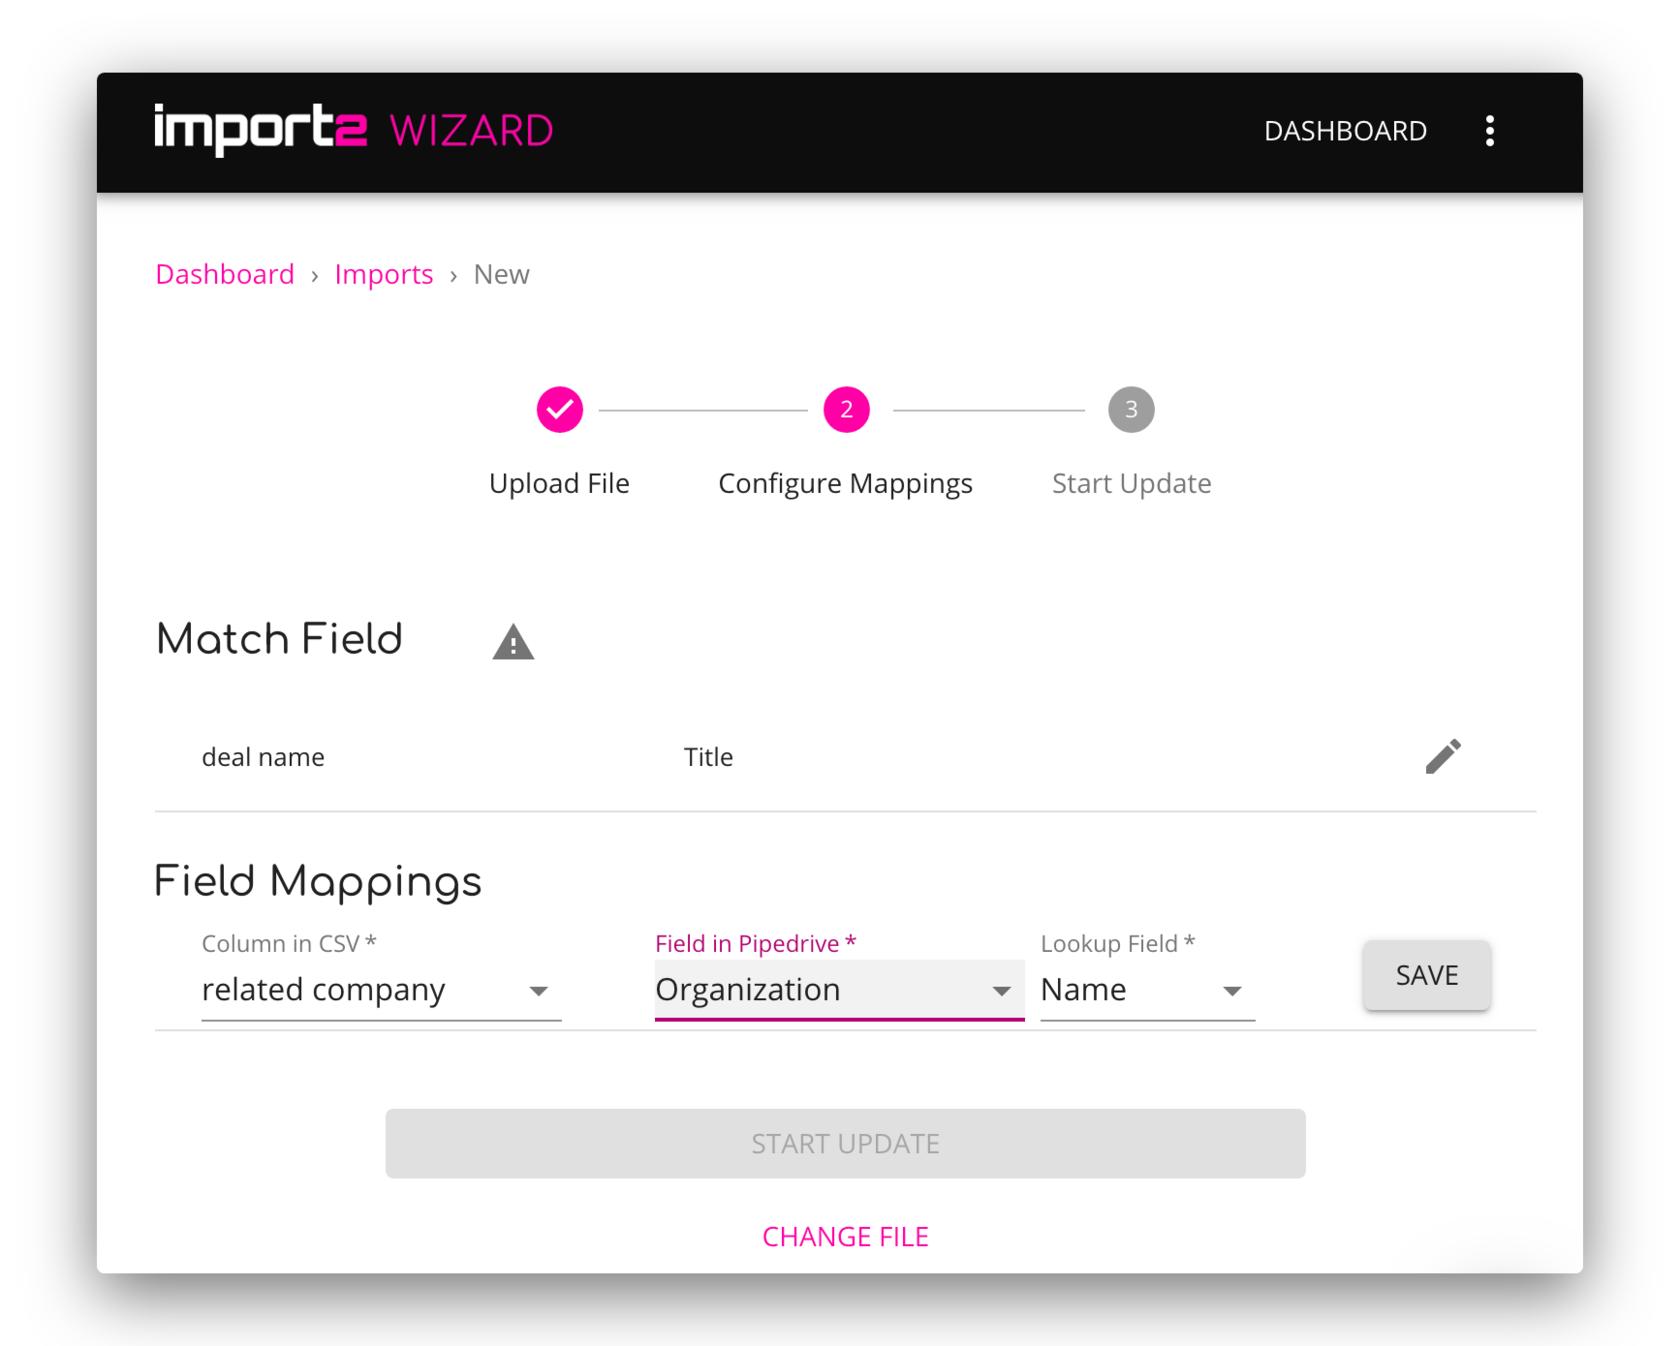 Import2Wizard dashboard